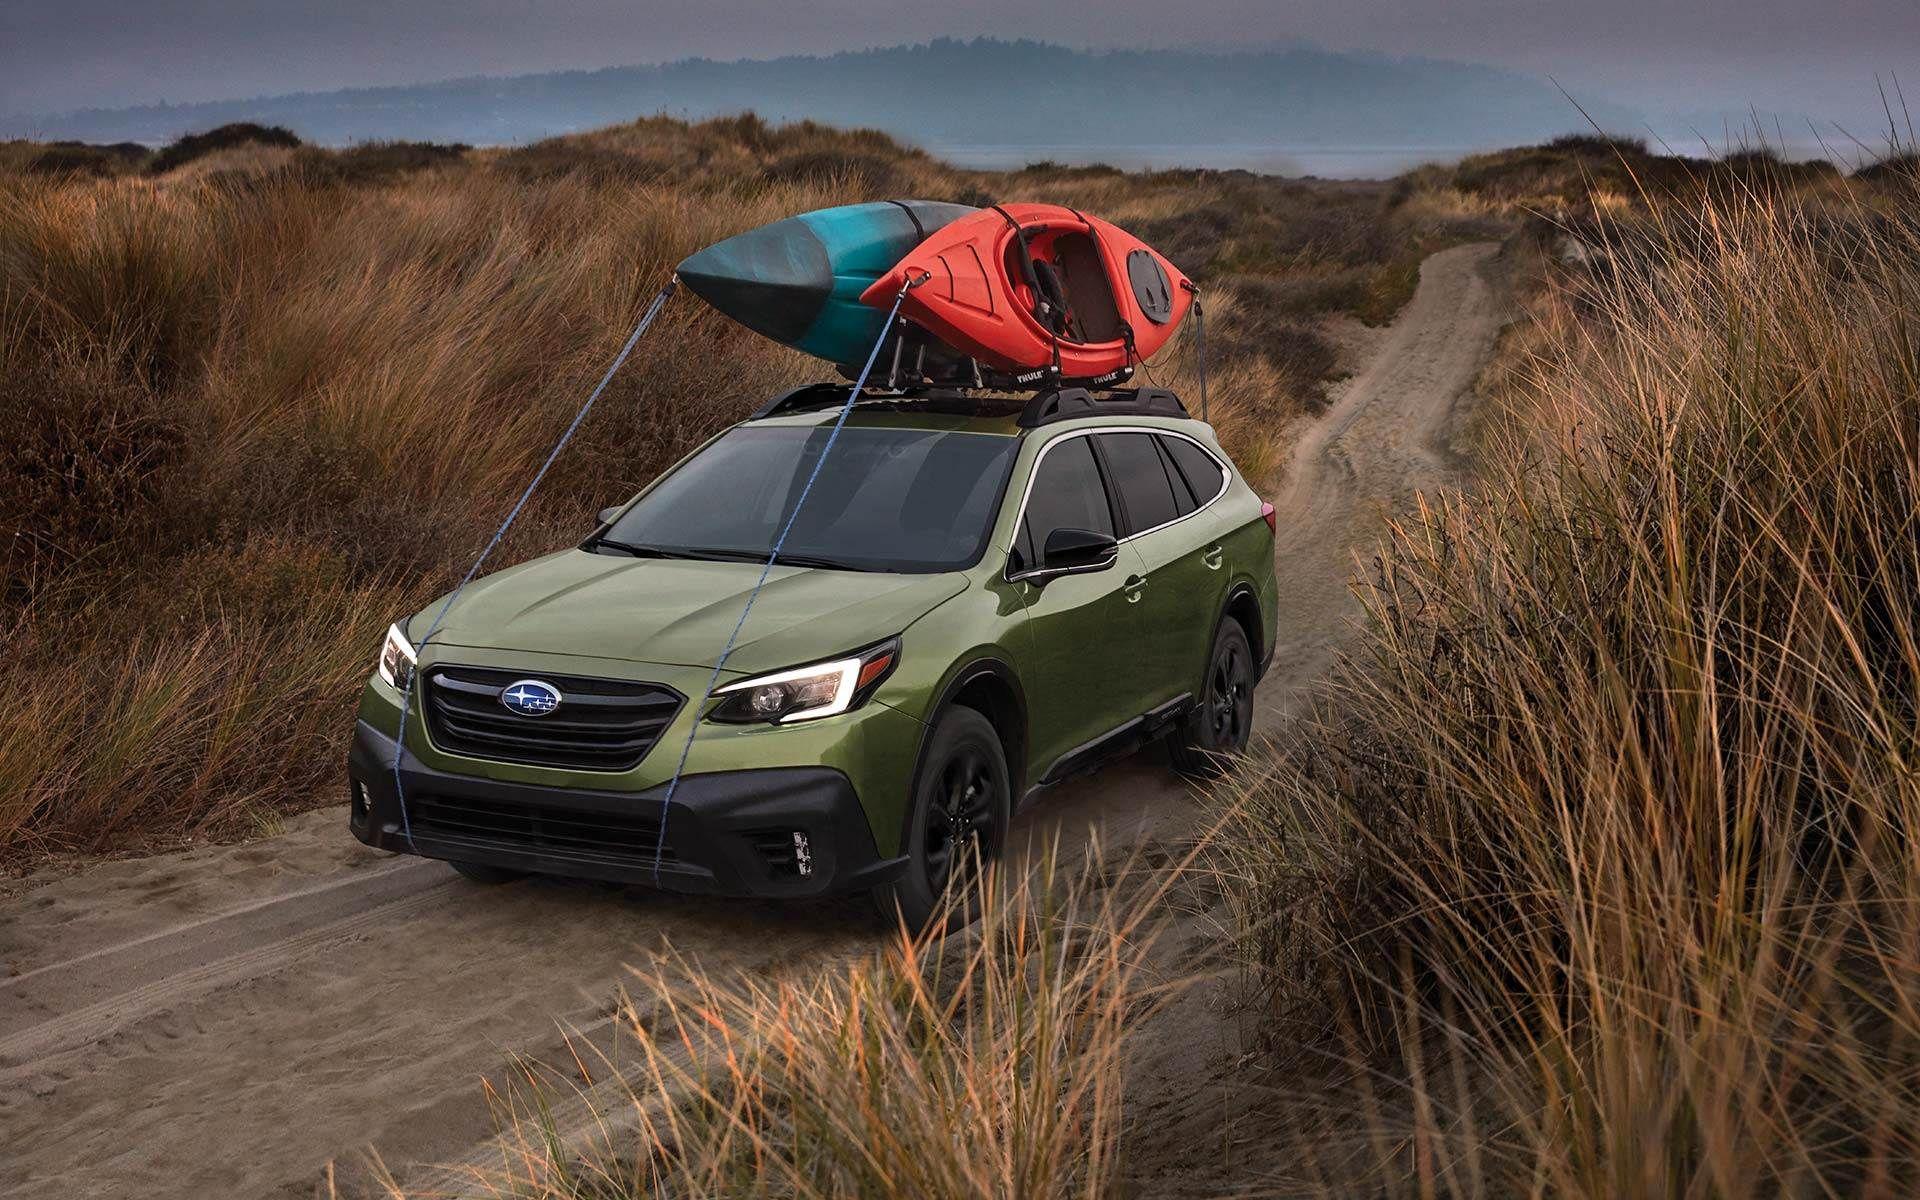 2021 Subaru Outback Subaru Outback Subaru Suv Subaru